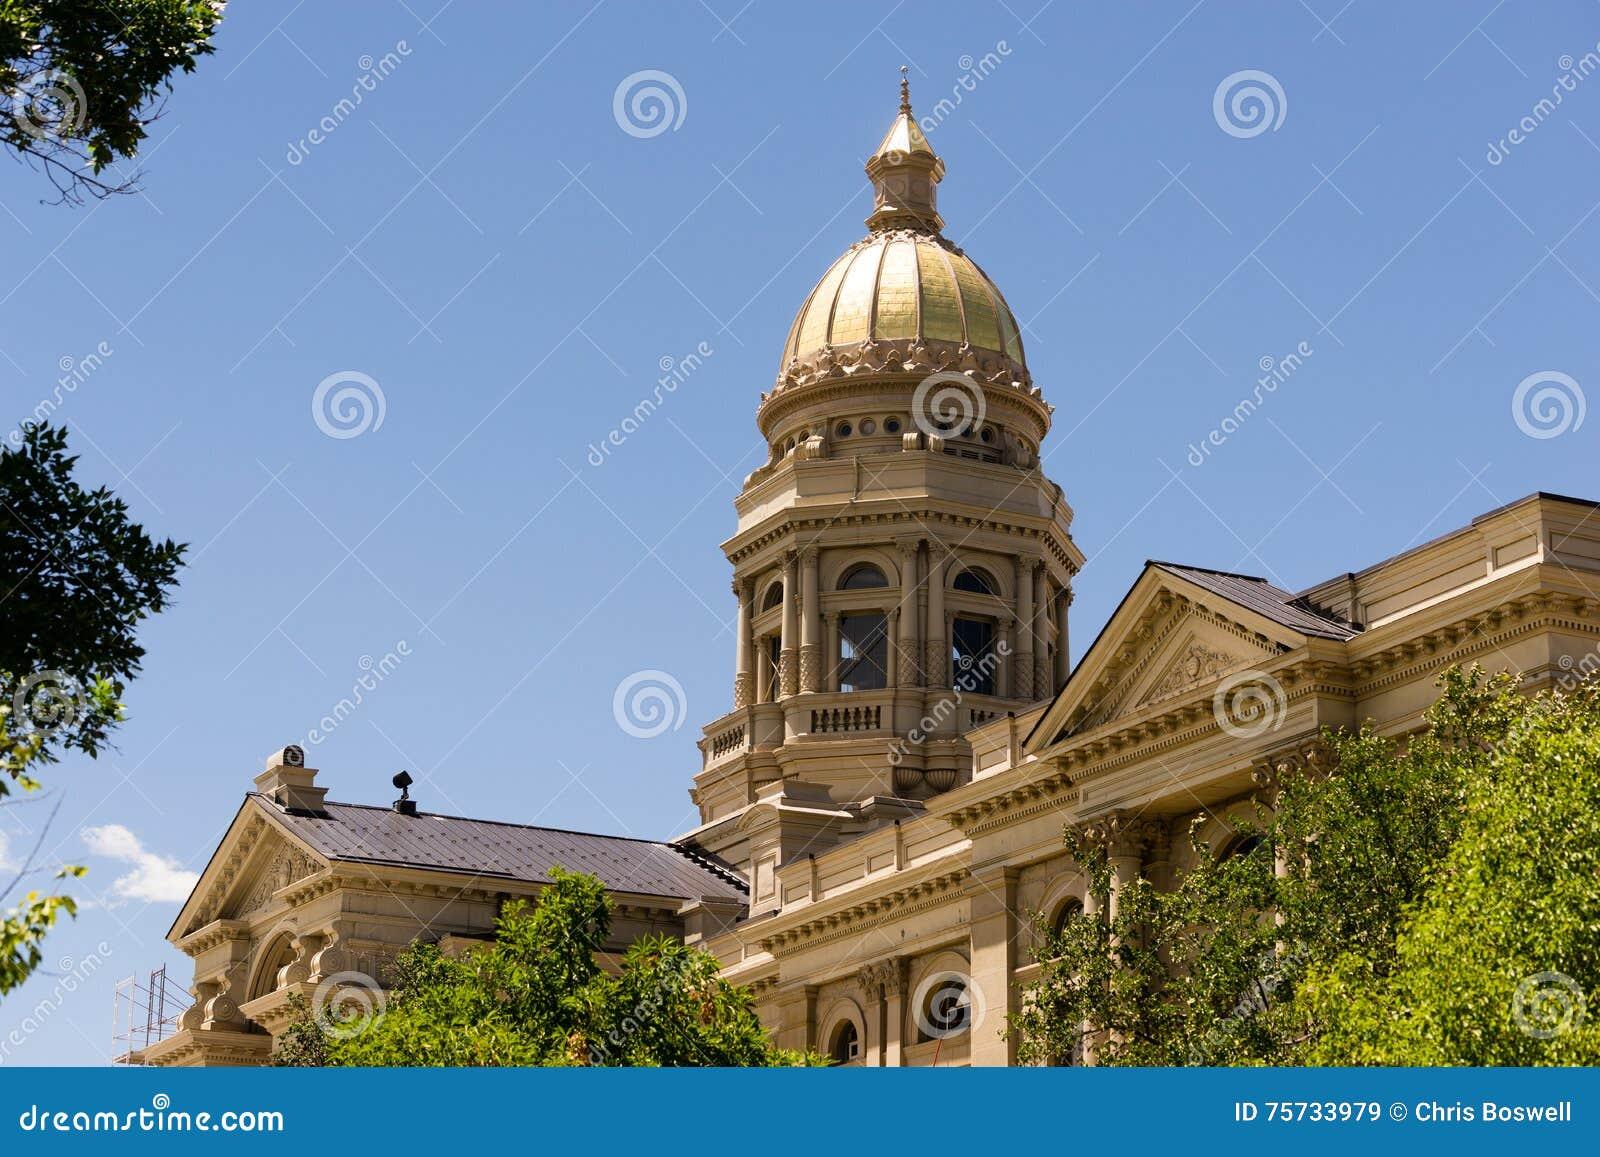 Cheyenne Wyoming Capital City Downtown Capitol Building Legislative Center